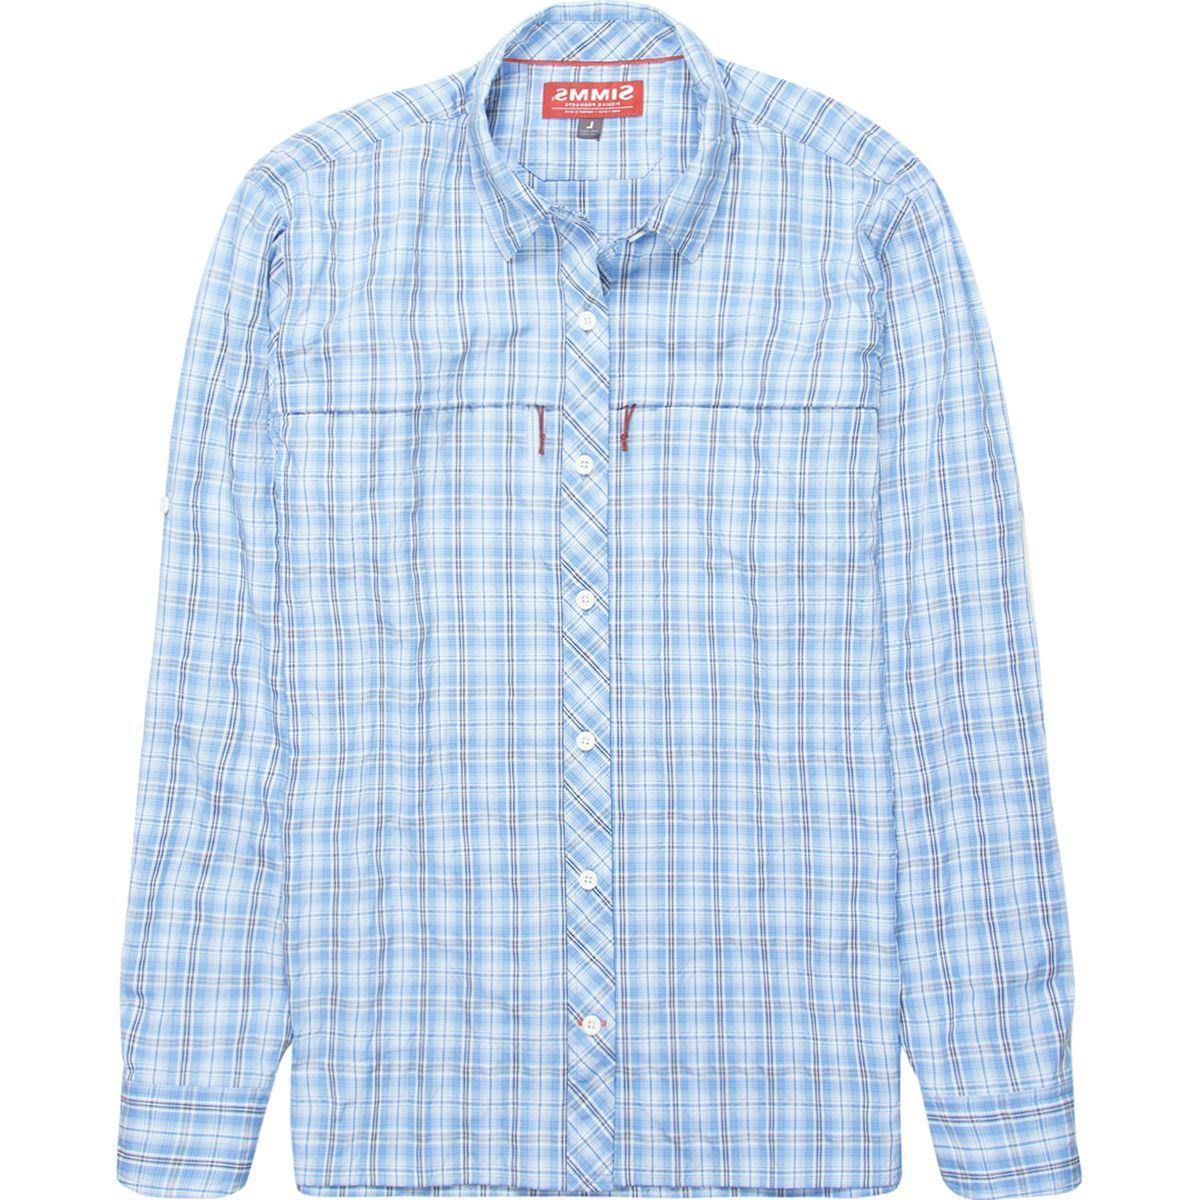 Simms Stone Cold Long-Sleeve Shirt - Men's